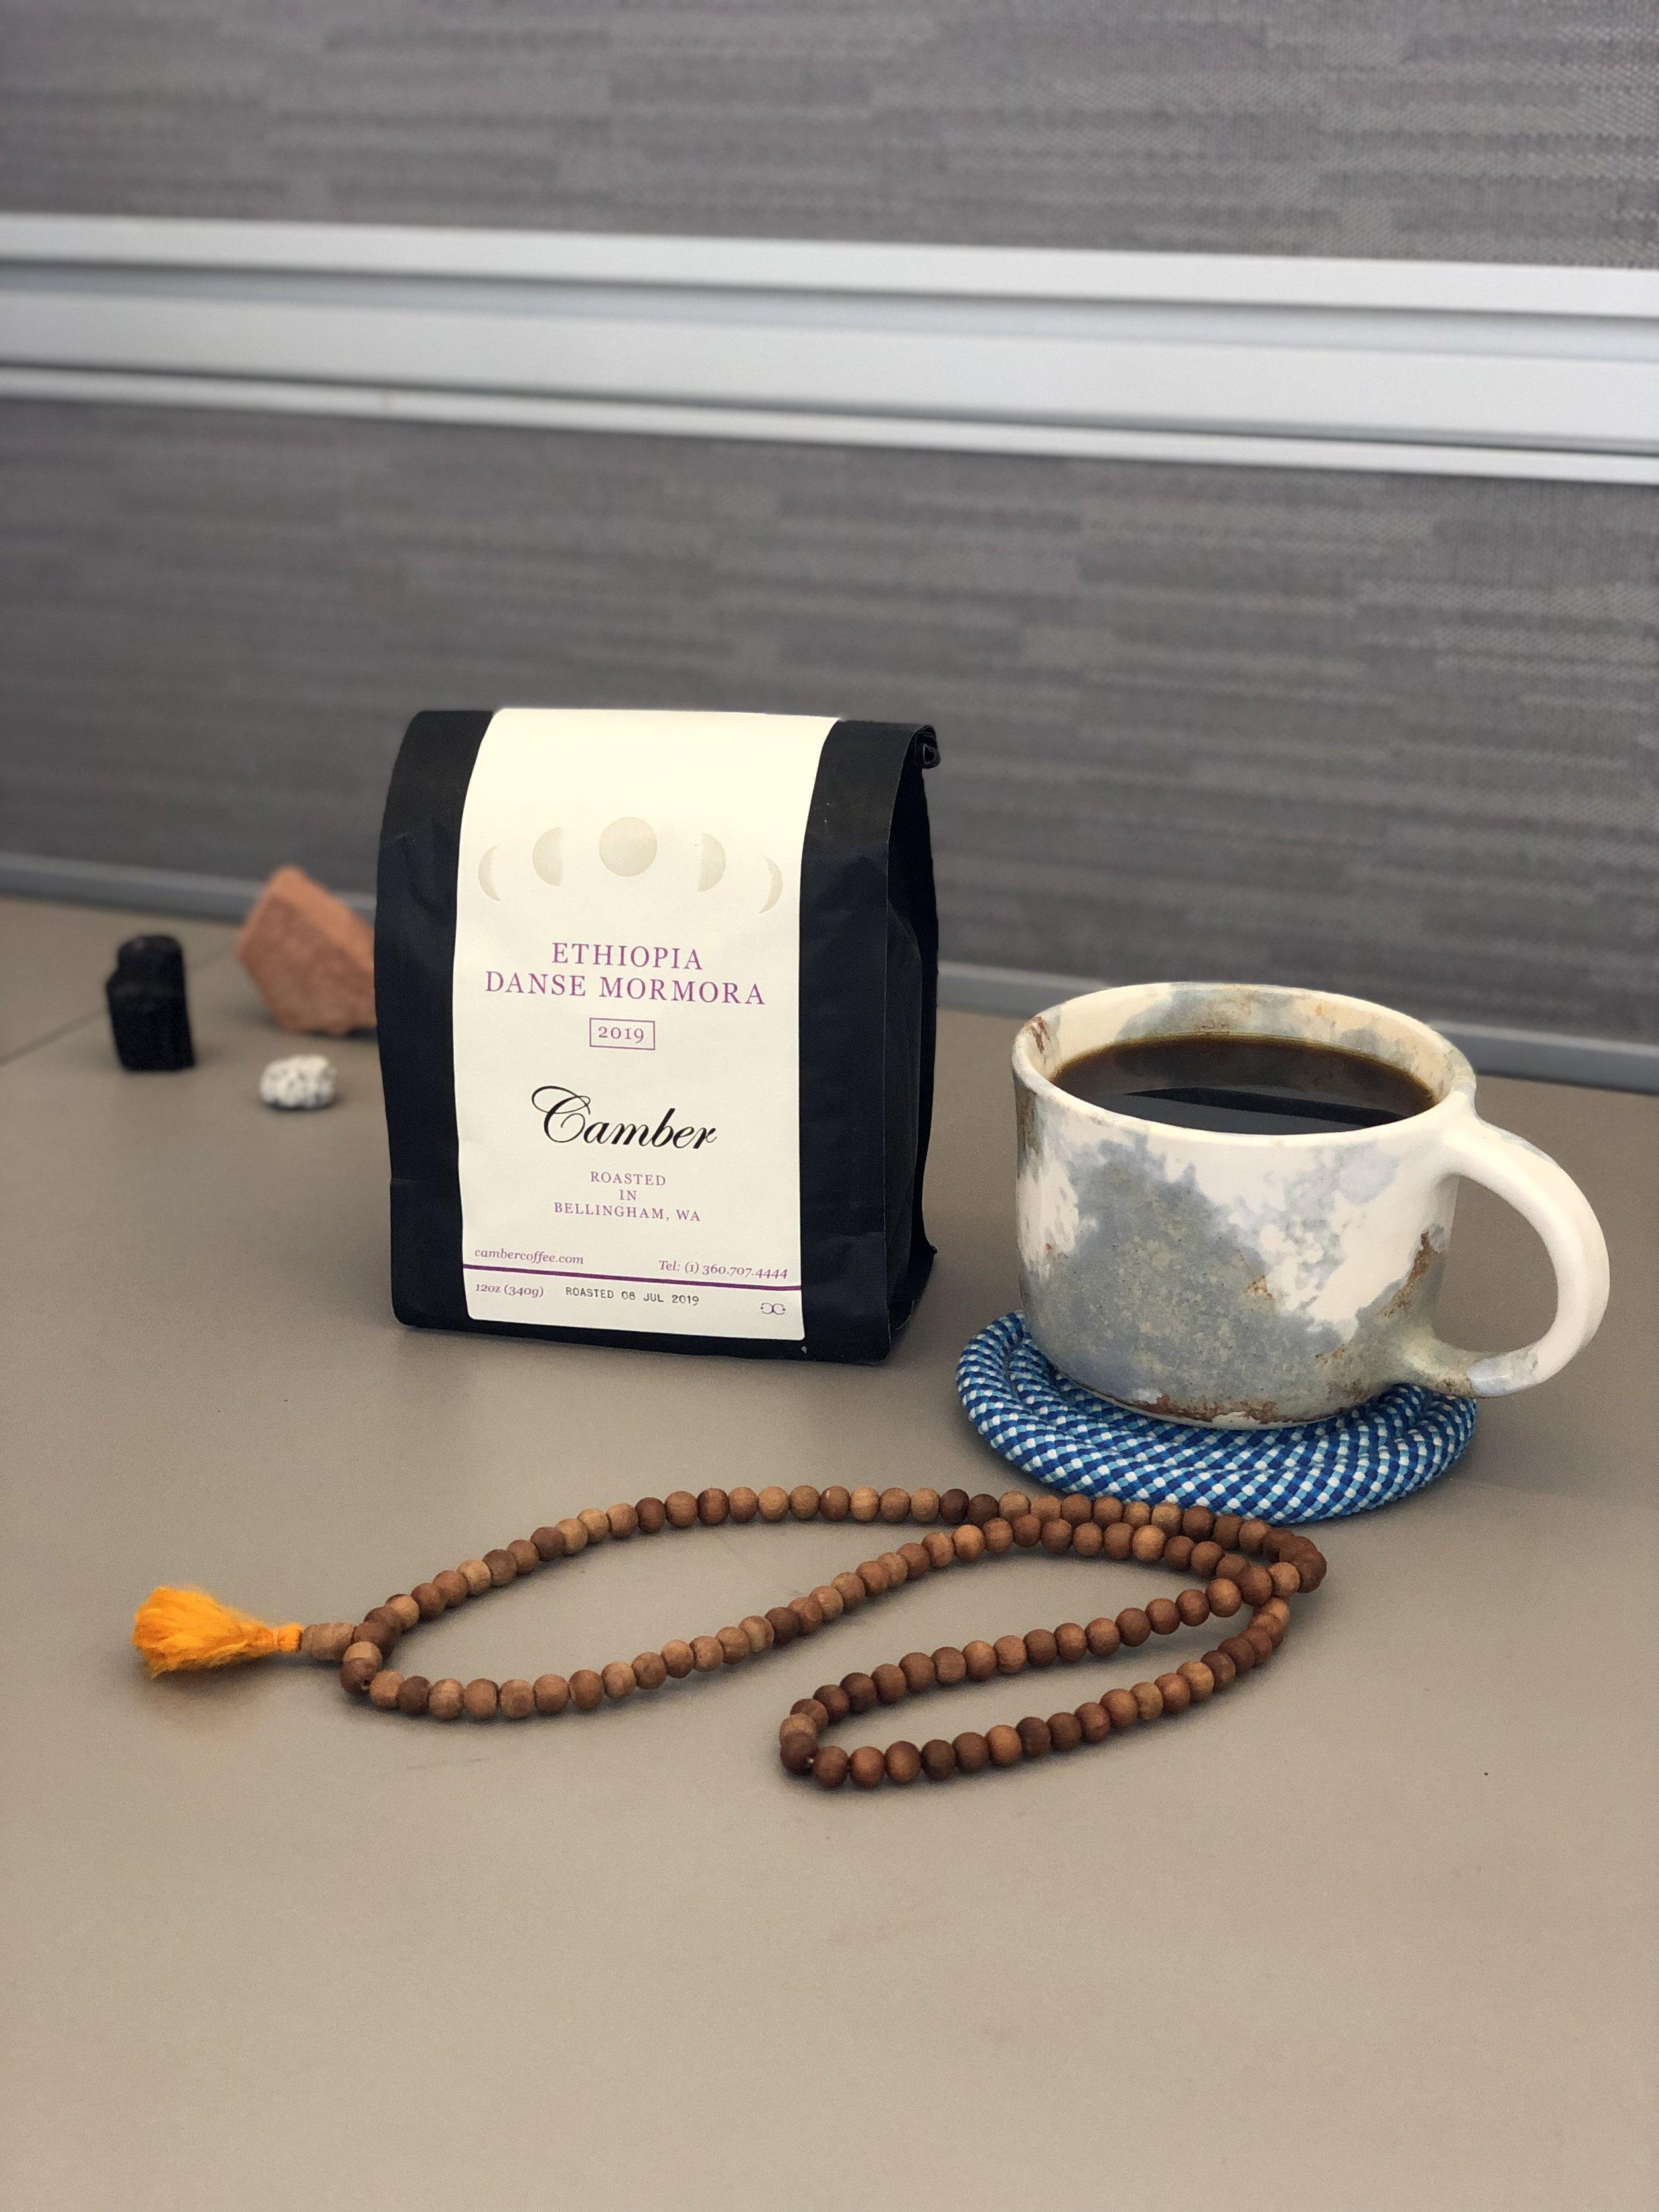 Camber Coffee's Ethiopia Danse Mormora